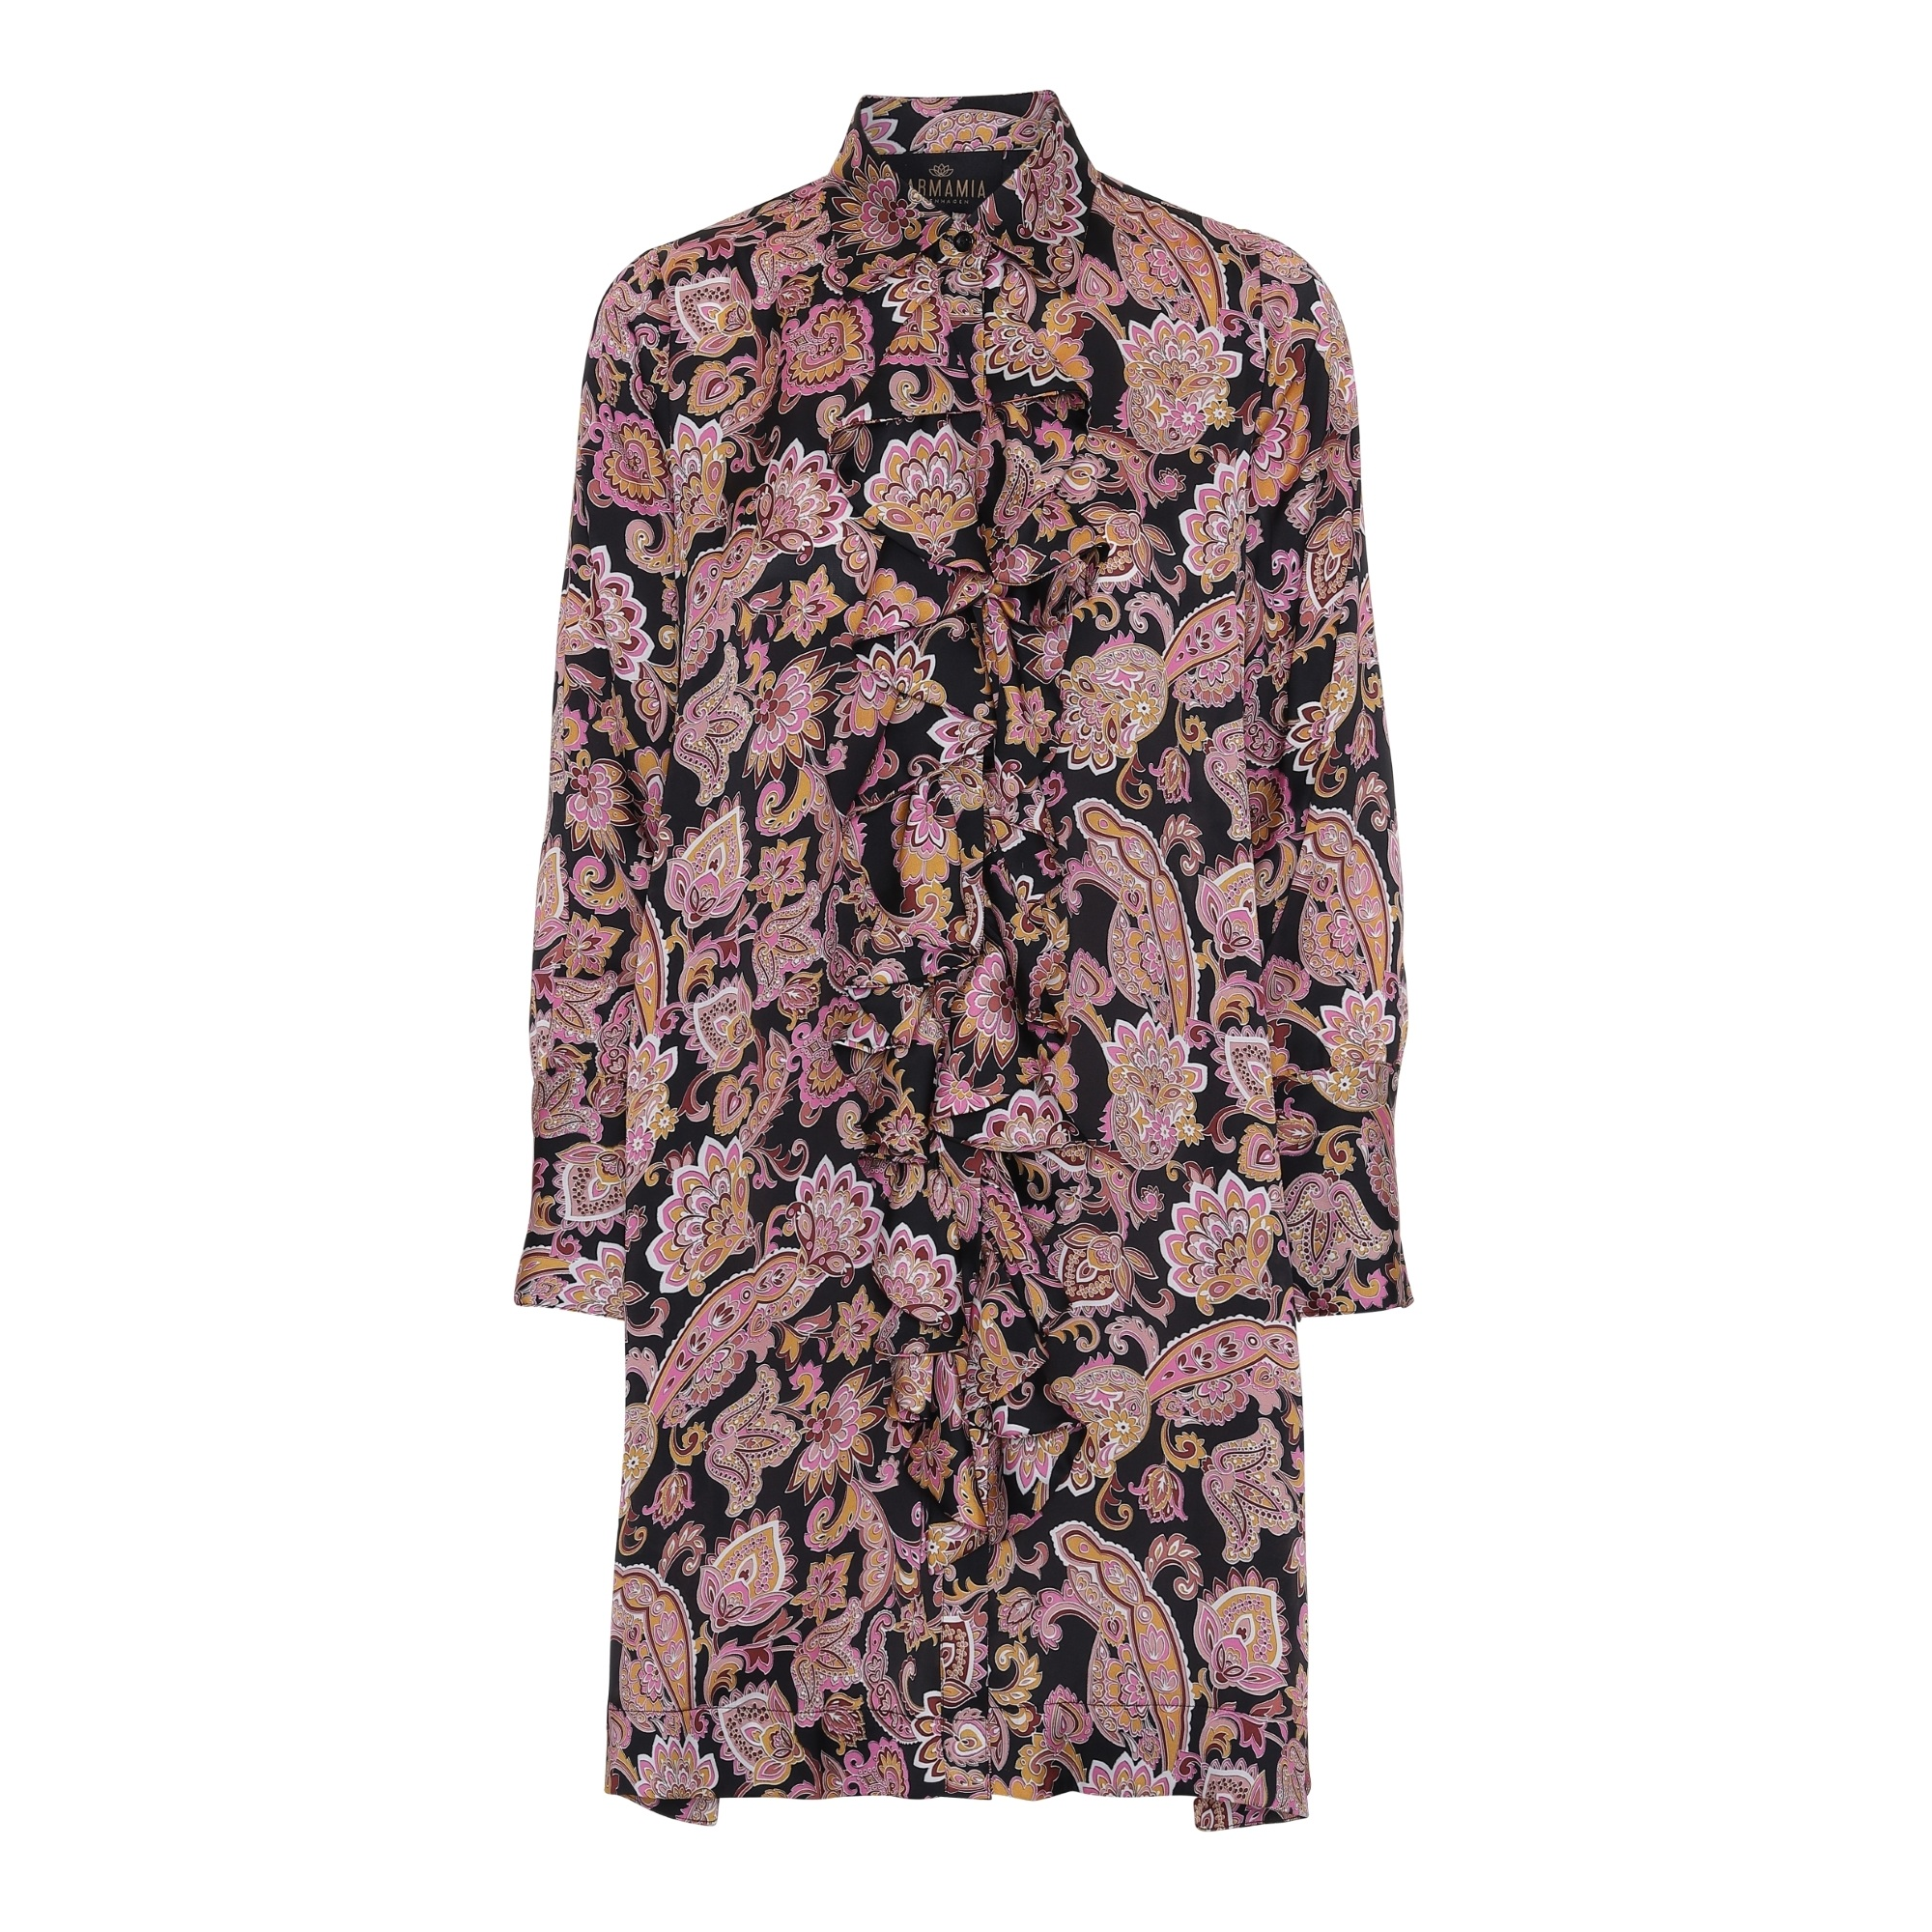 Ruffle-Kimono-Dress-Cabaret IMAGE BY ME